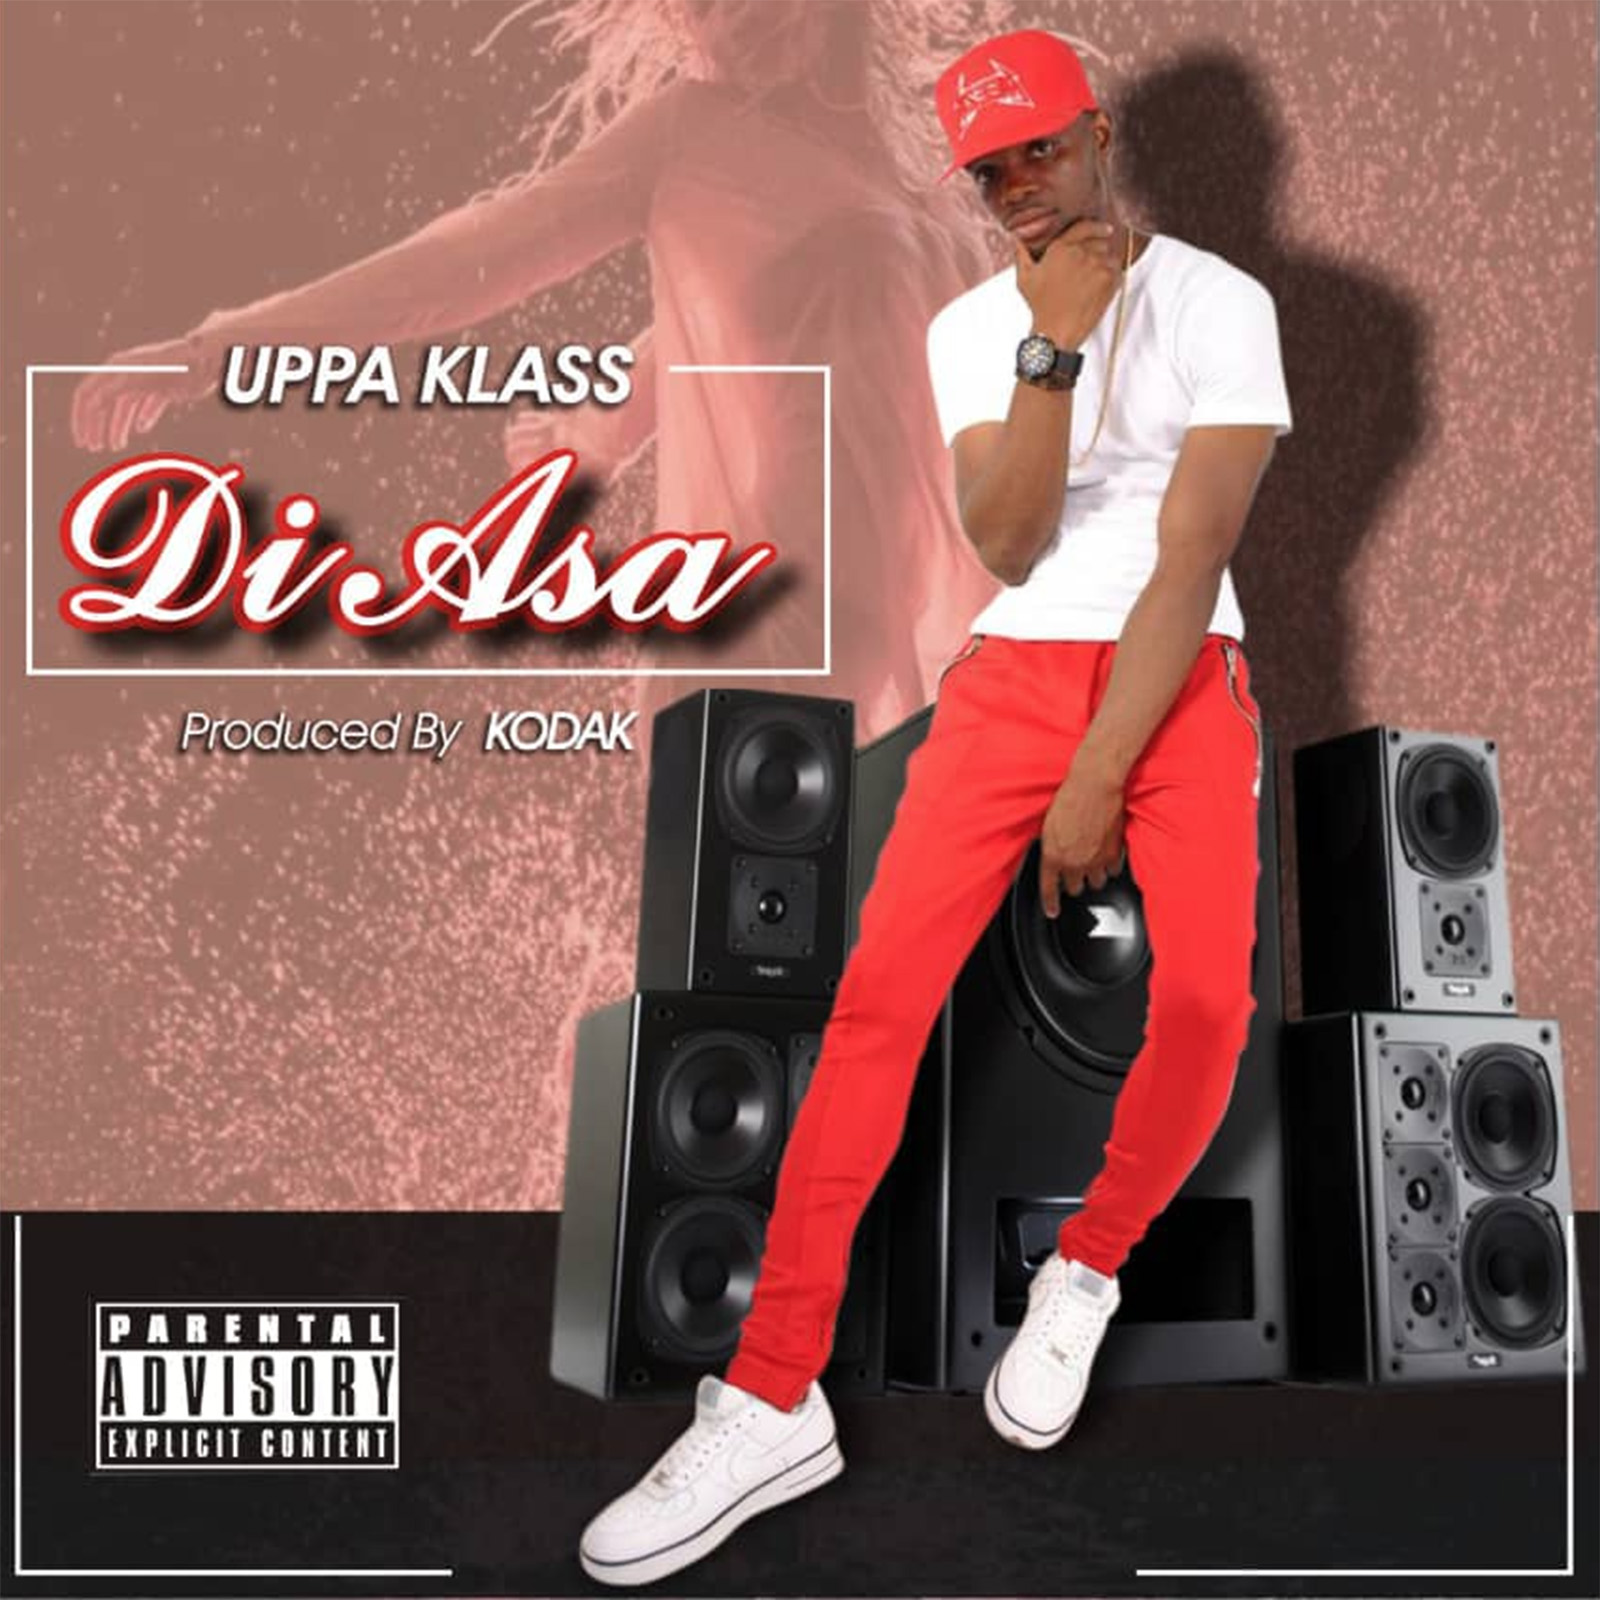 Di Asa by Upaa Klass